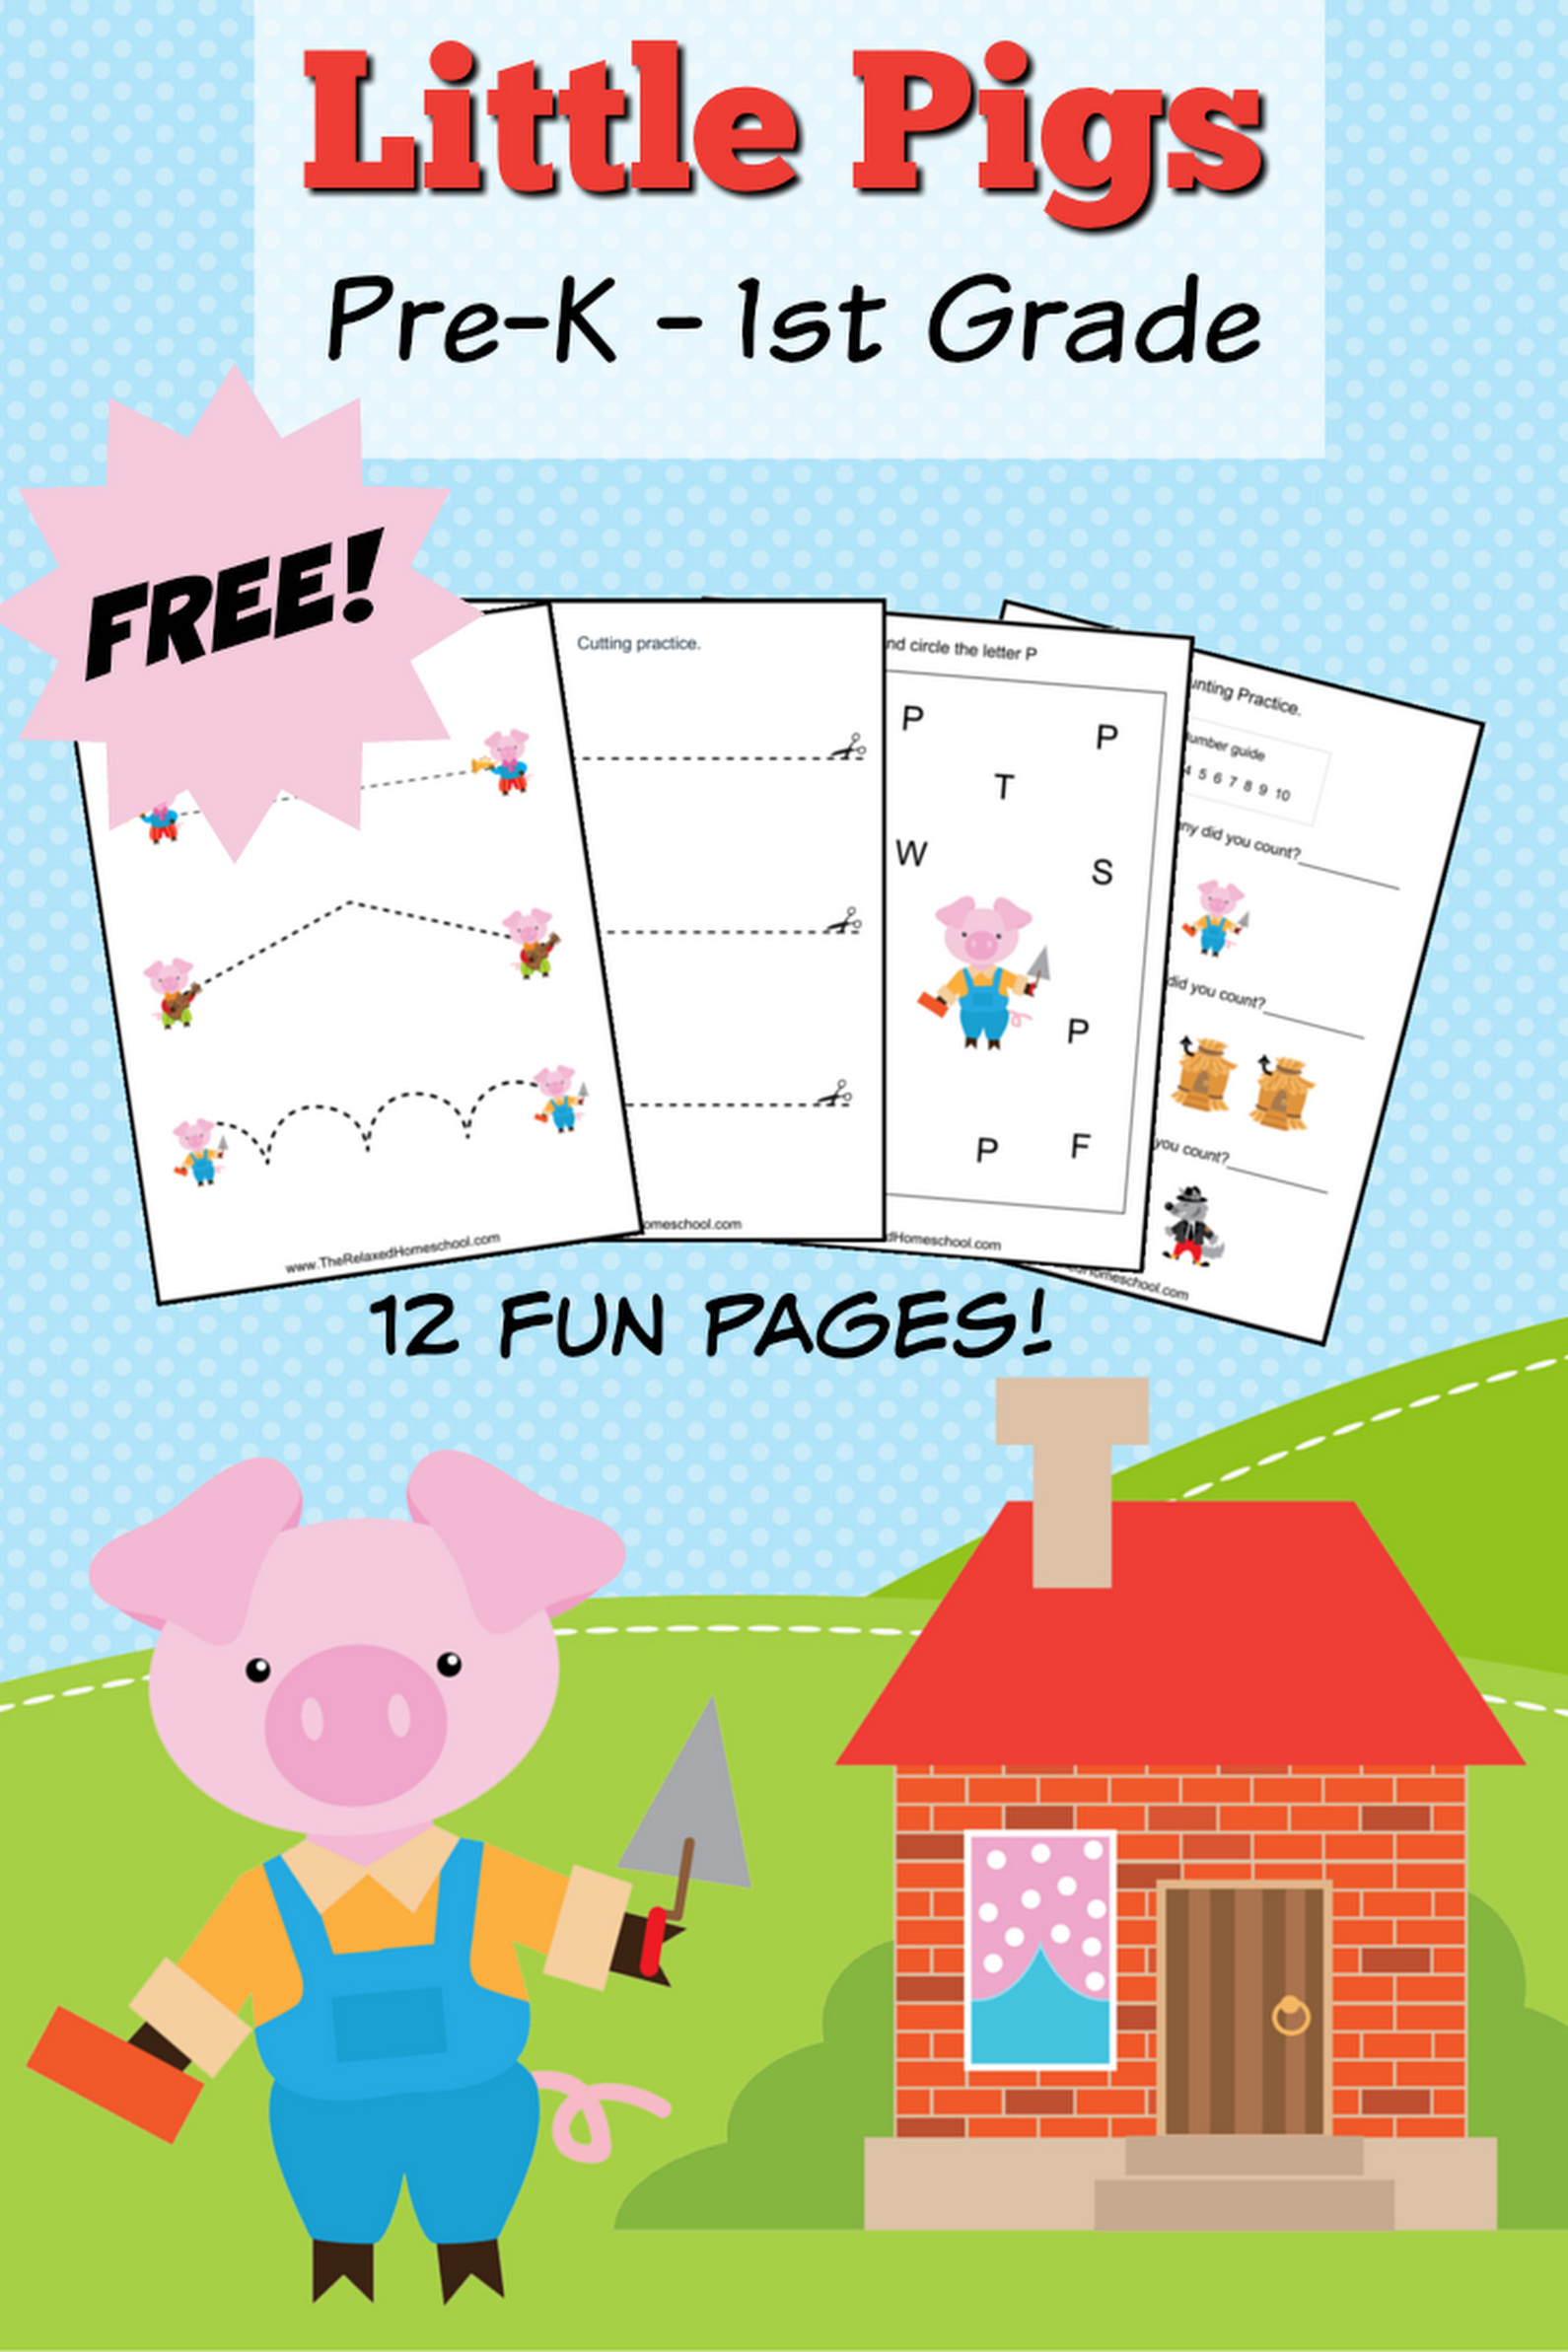 Free Three Little Pigs Theme Pack